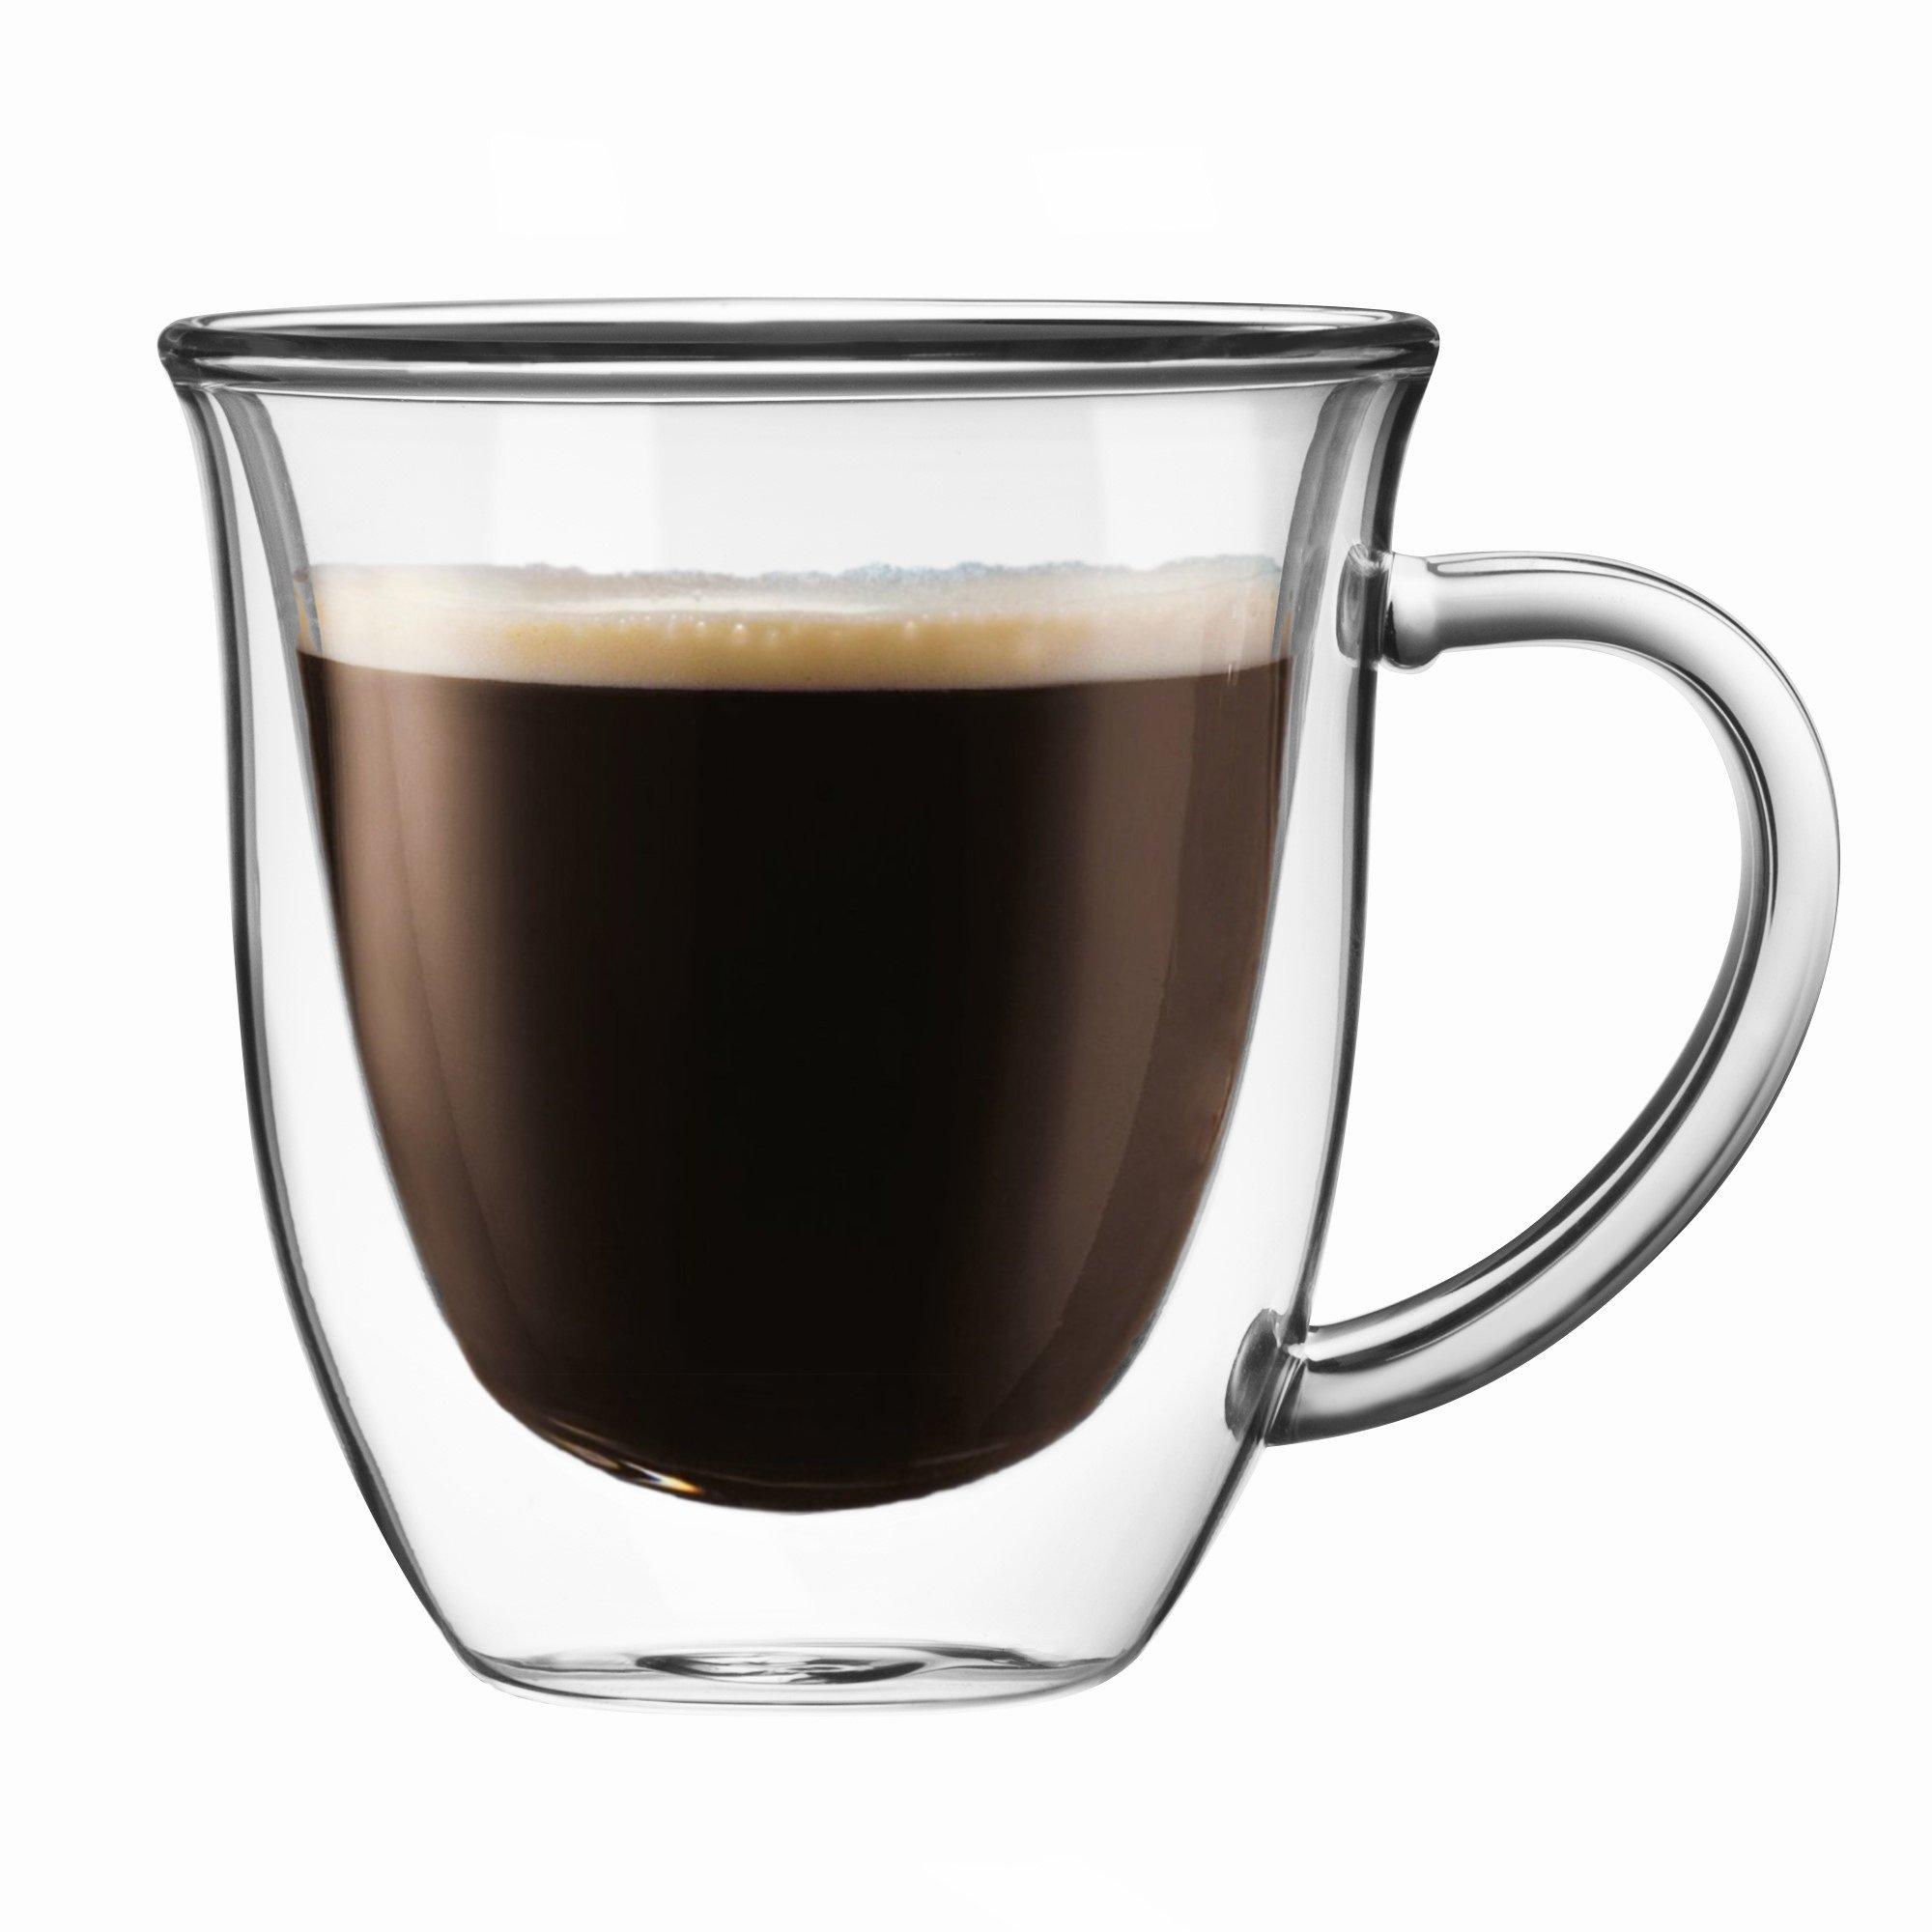 JoyJolt Serene Double Walled Glasses insulated Coffee Mug 7.4 Oz (Set of 2)